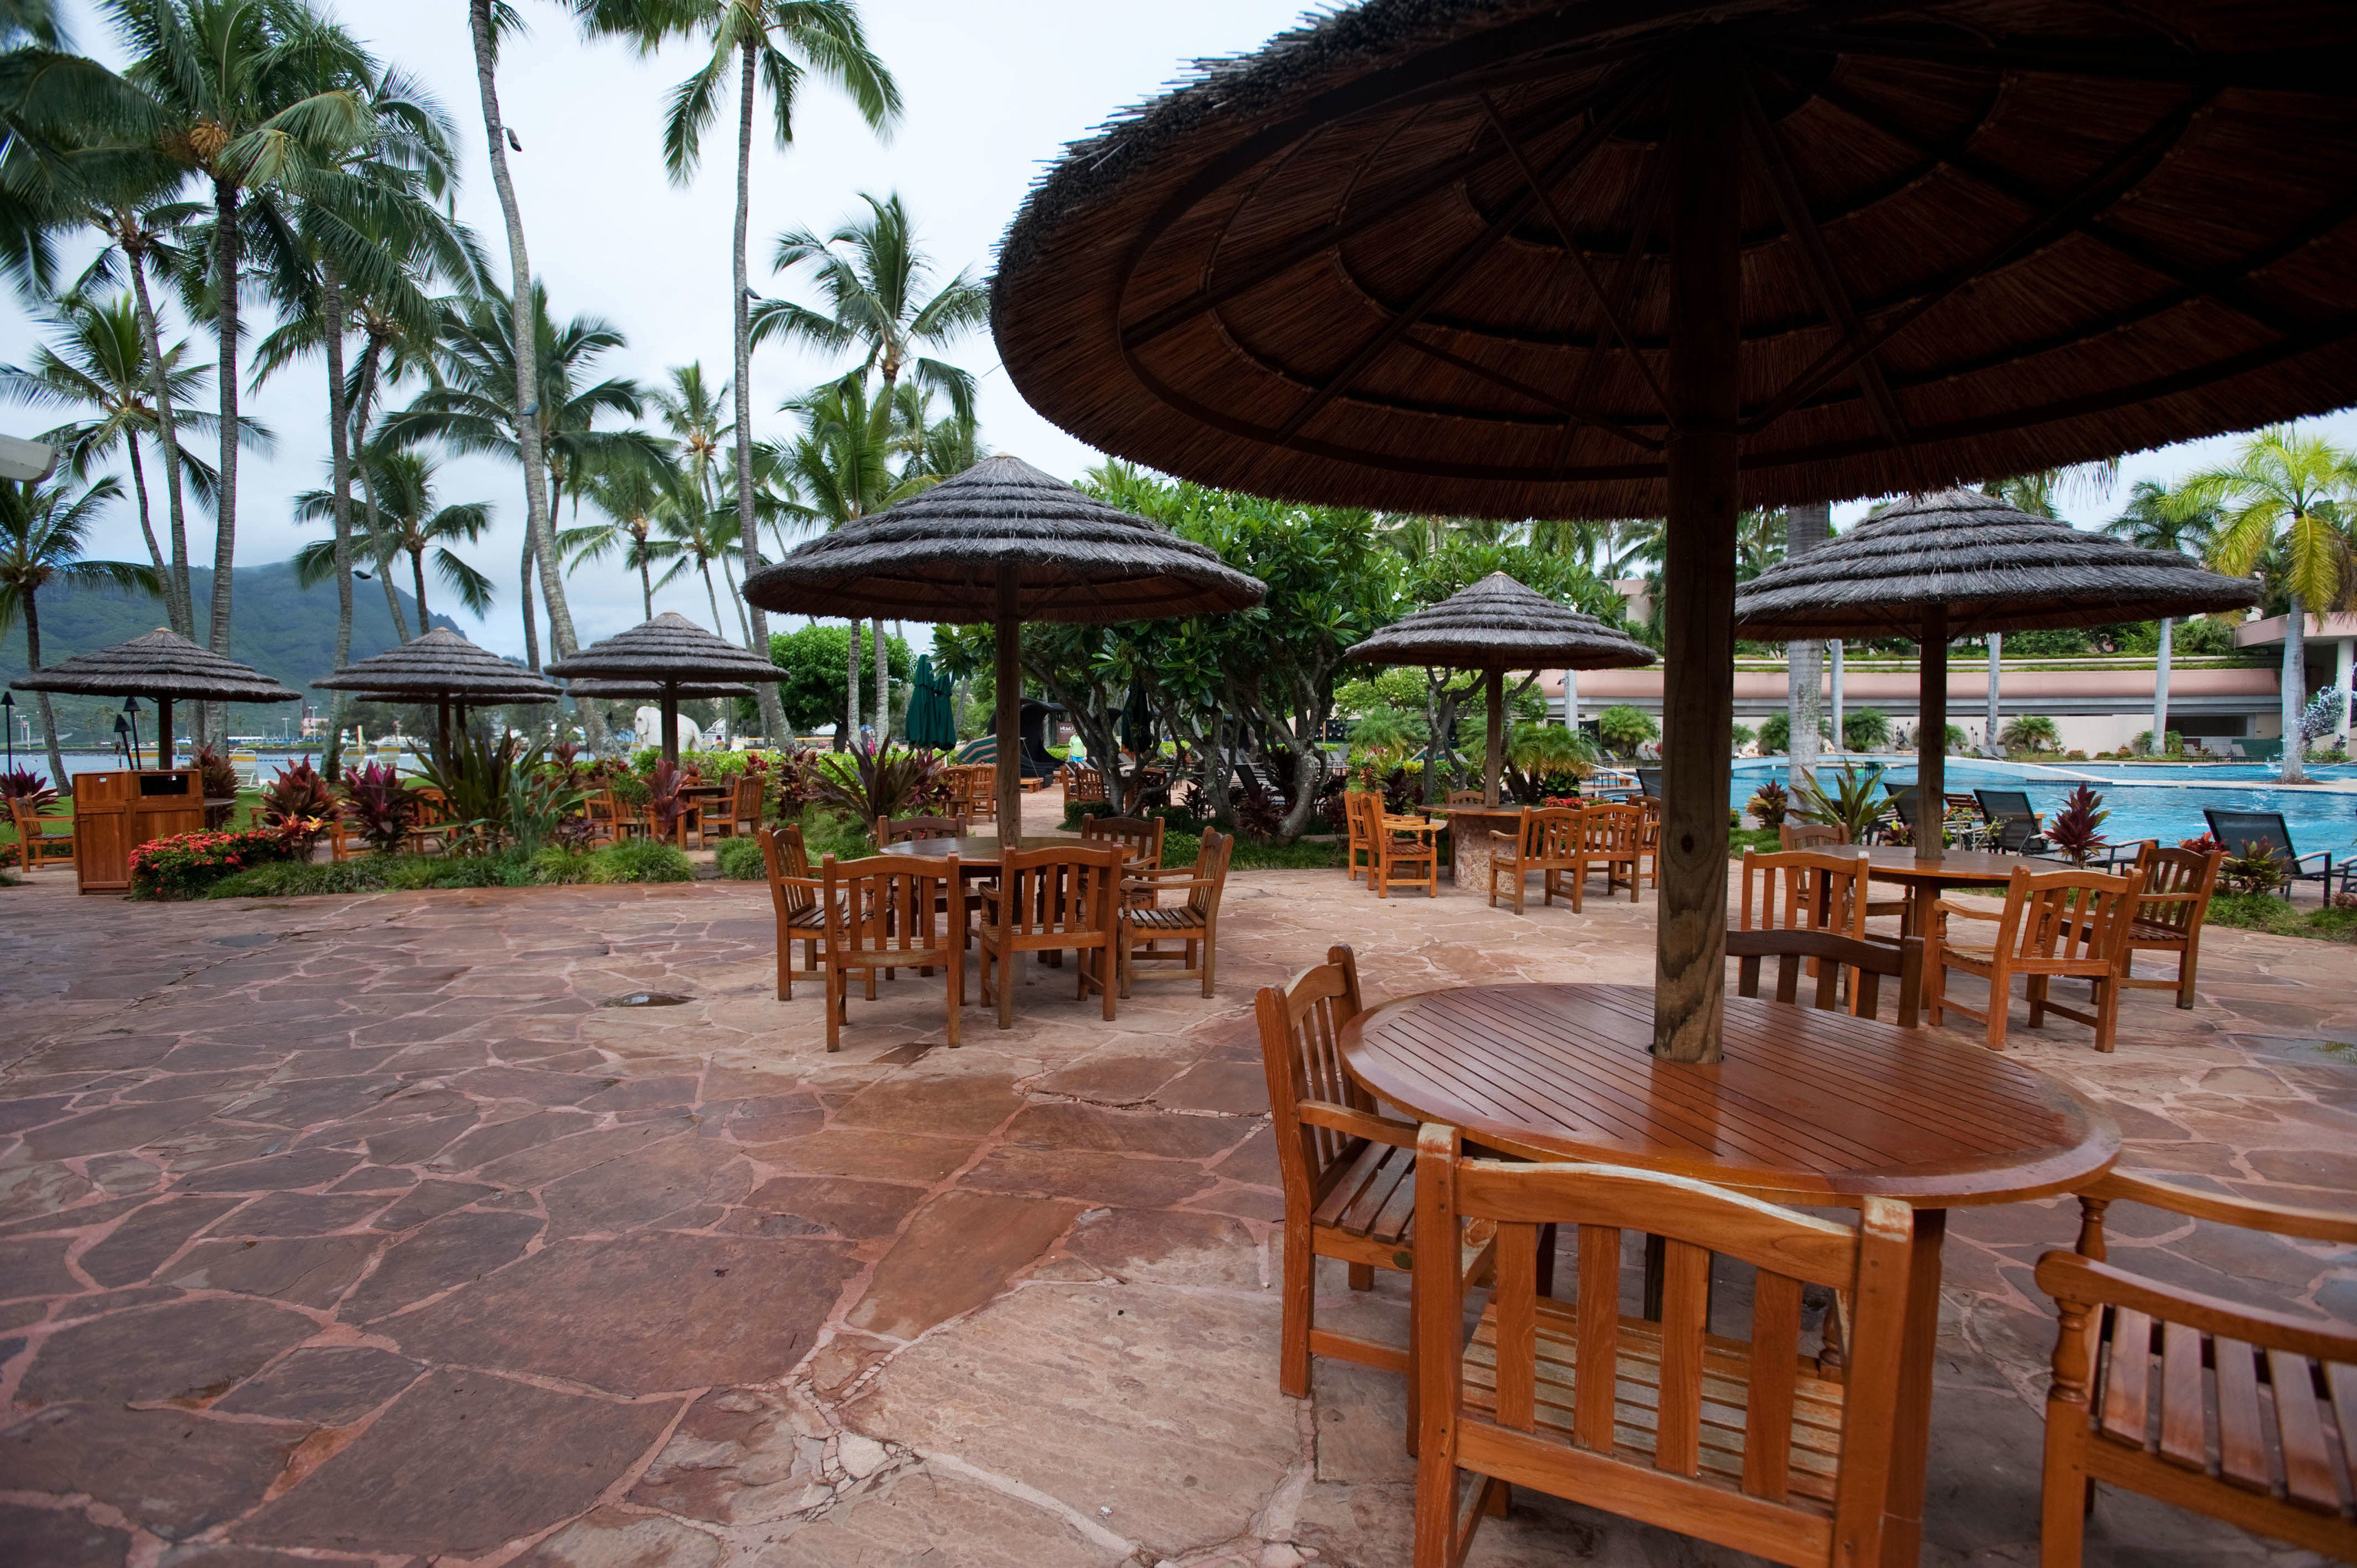 tree ground umbrella chair leisure property Resort hacienda outdoor structure Dining shade